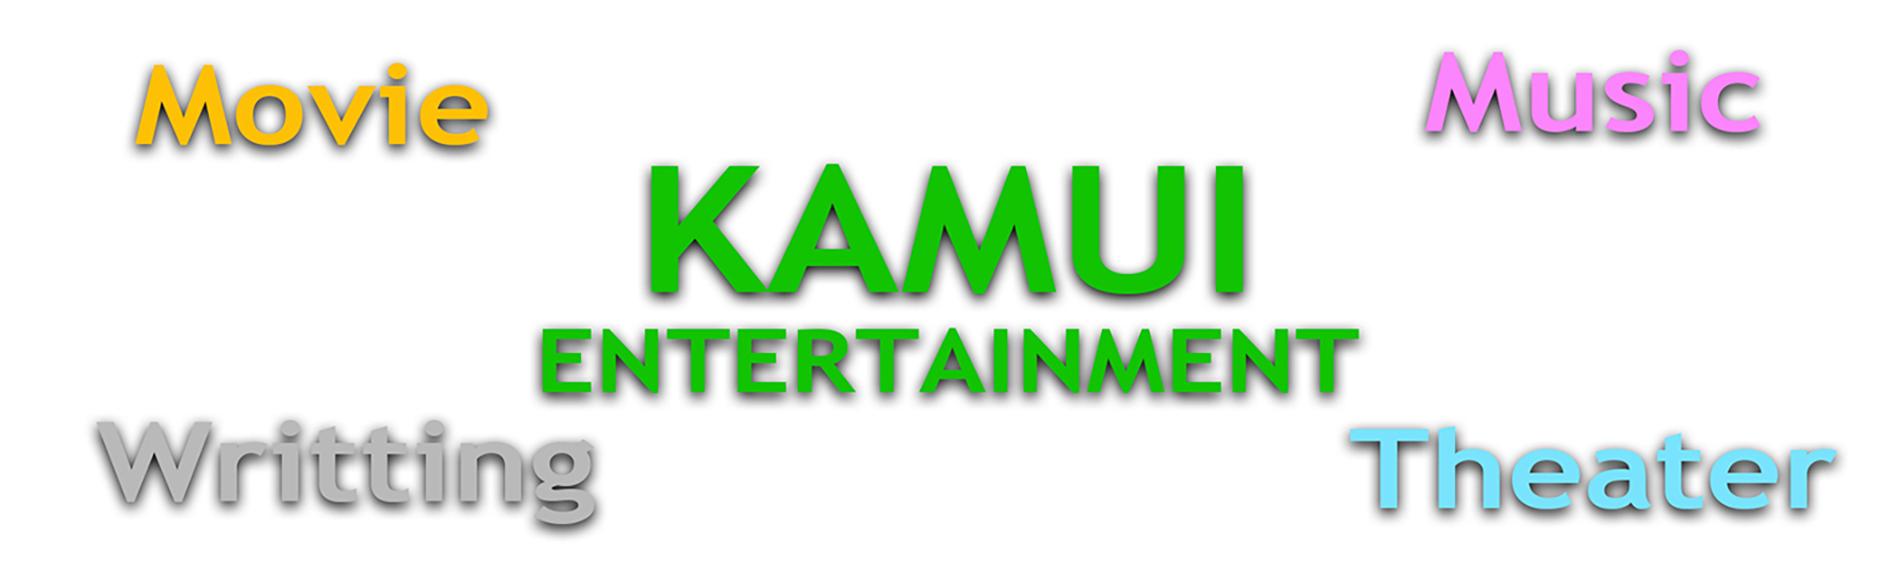 http://kamuicreate.com/entertainment/